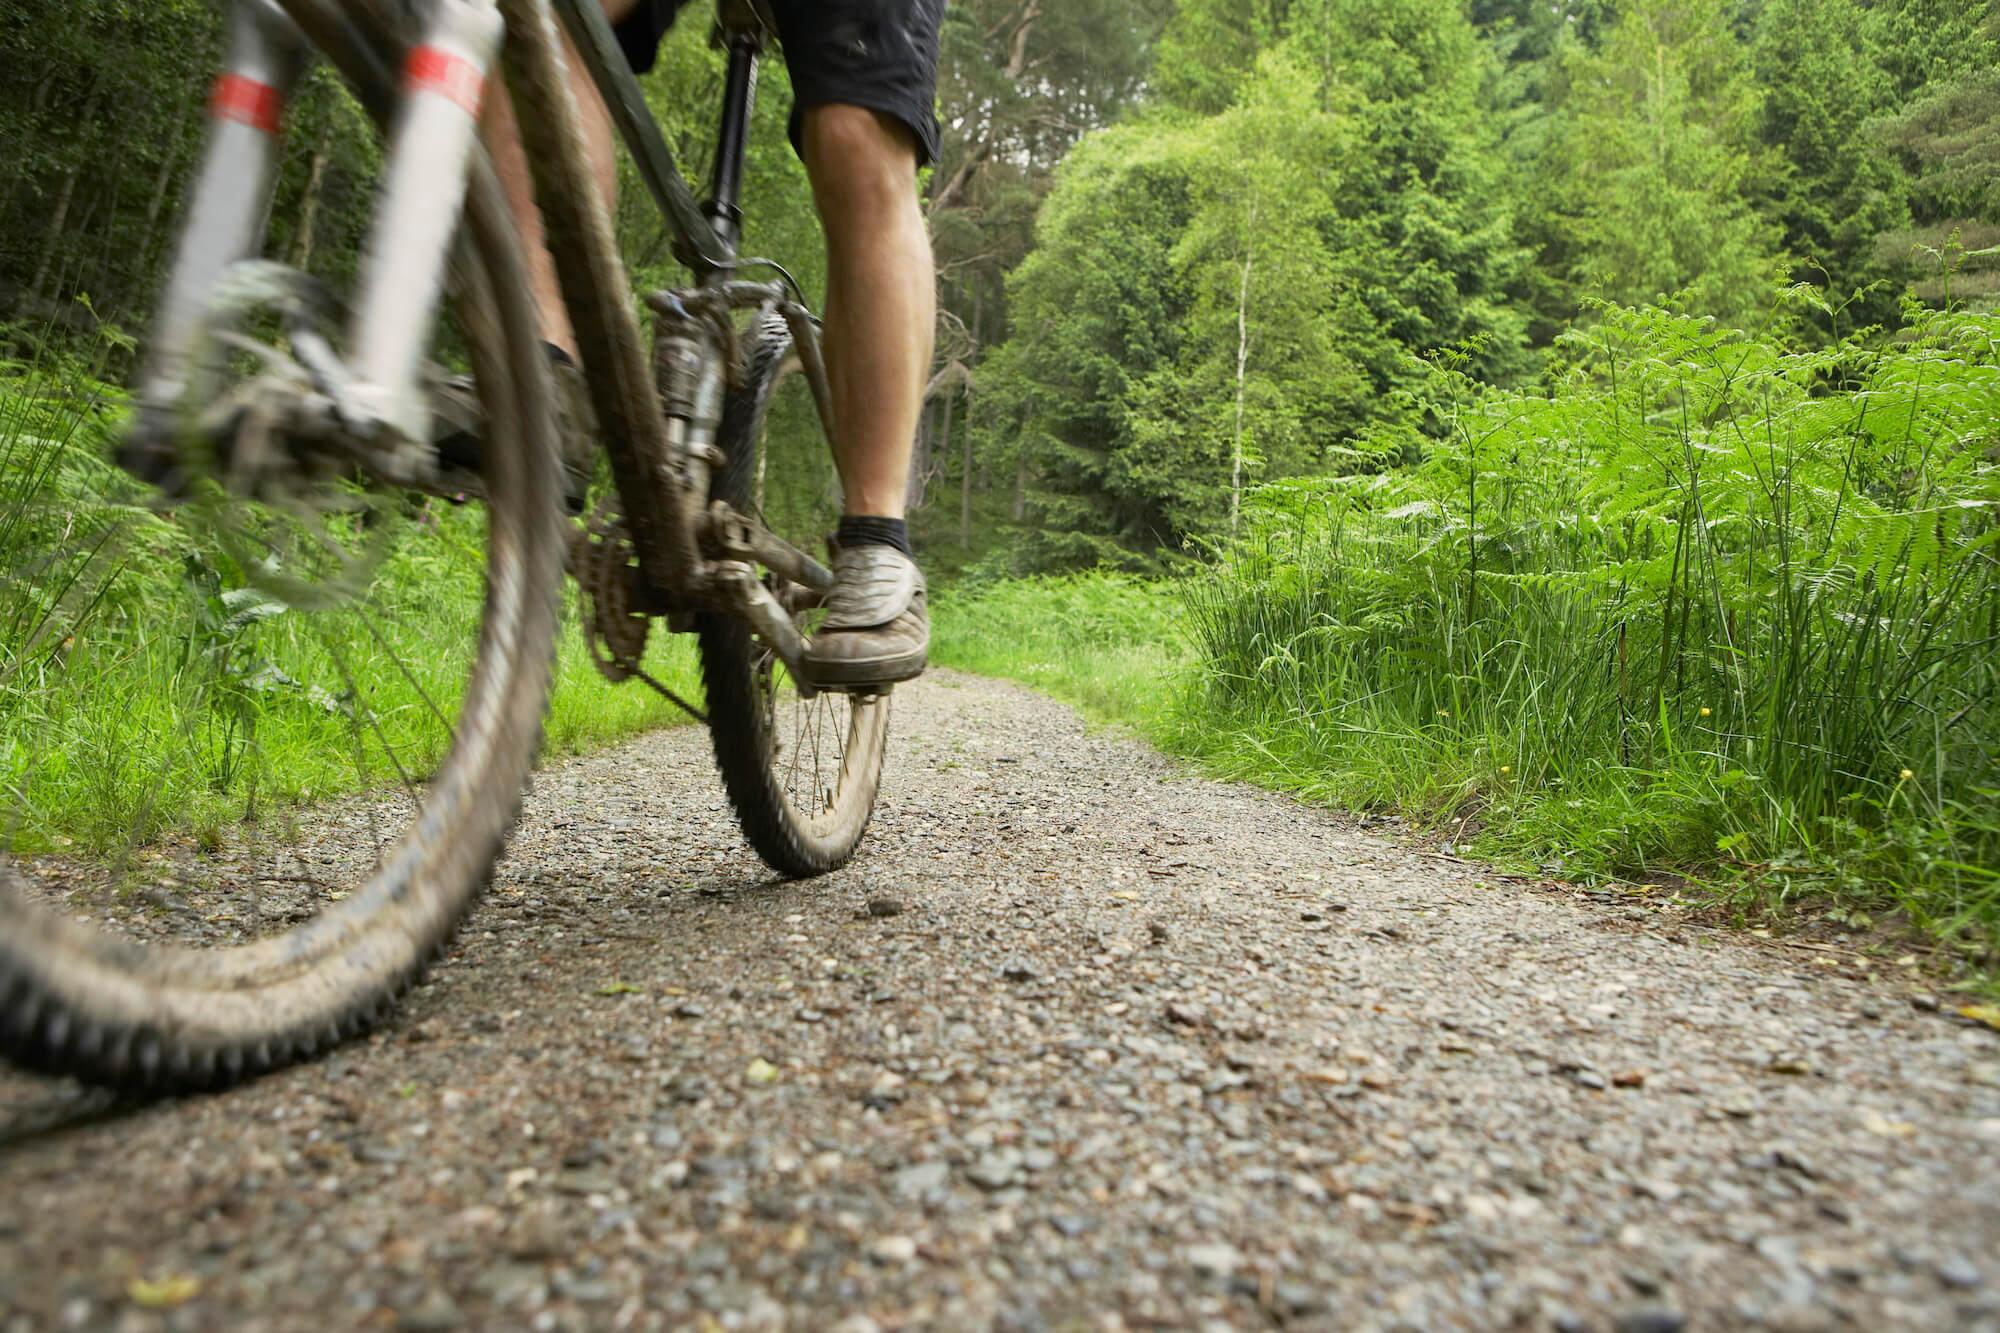 Mountainbiker on a Trail